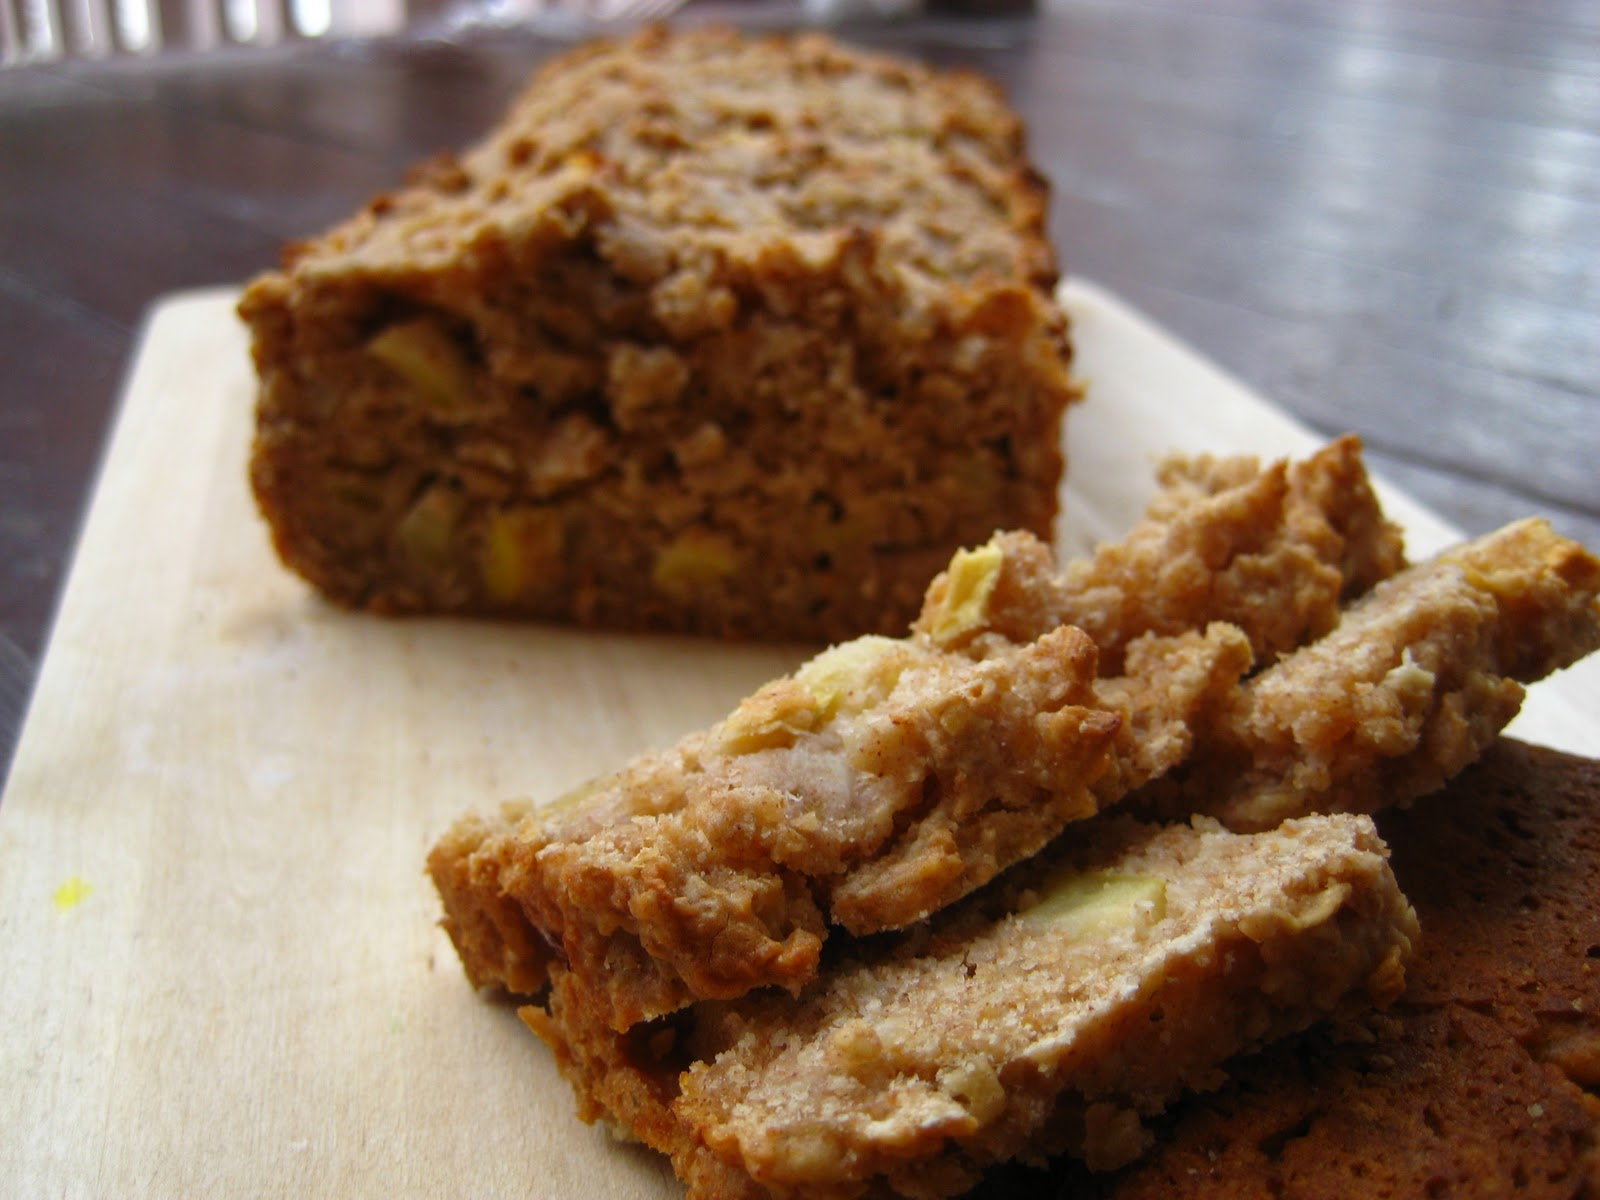 Coconut Crumbs: Apple Oatmeal Quick Bread